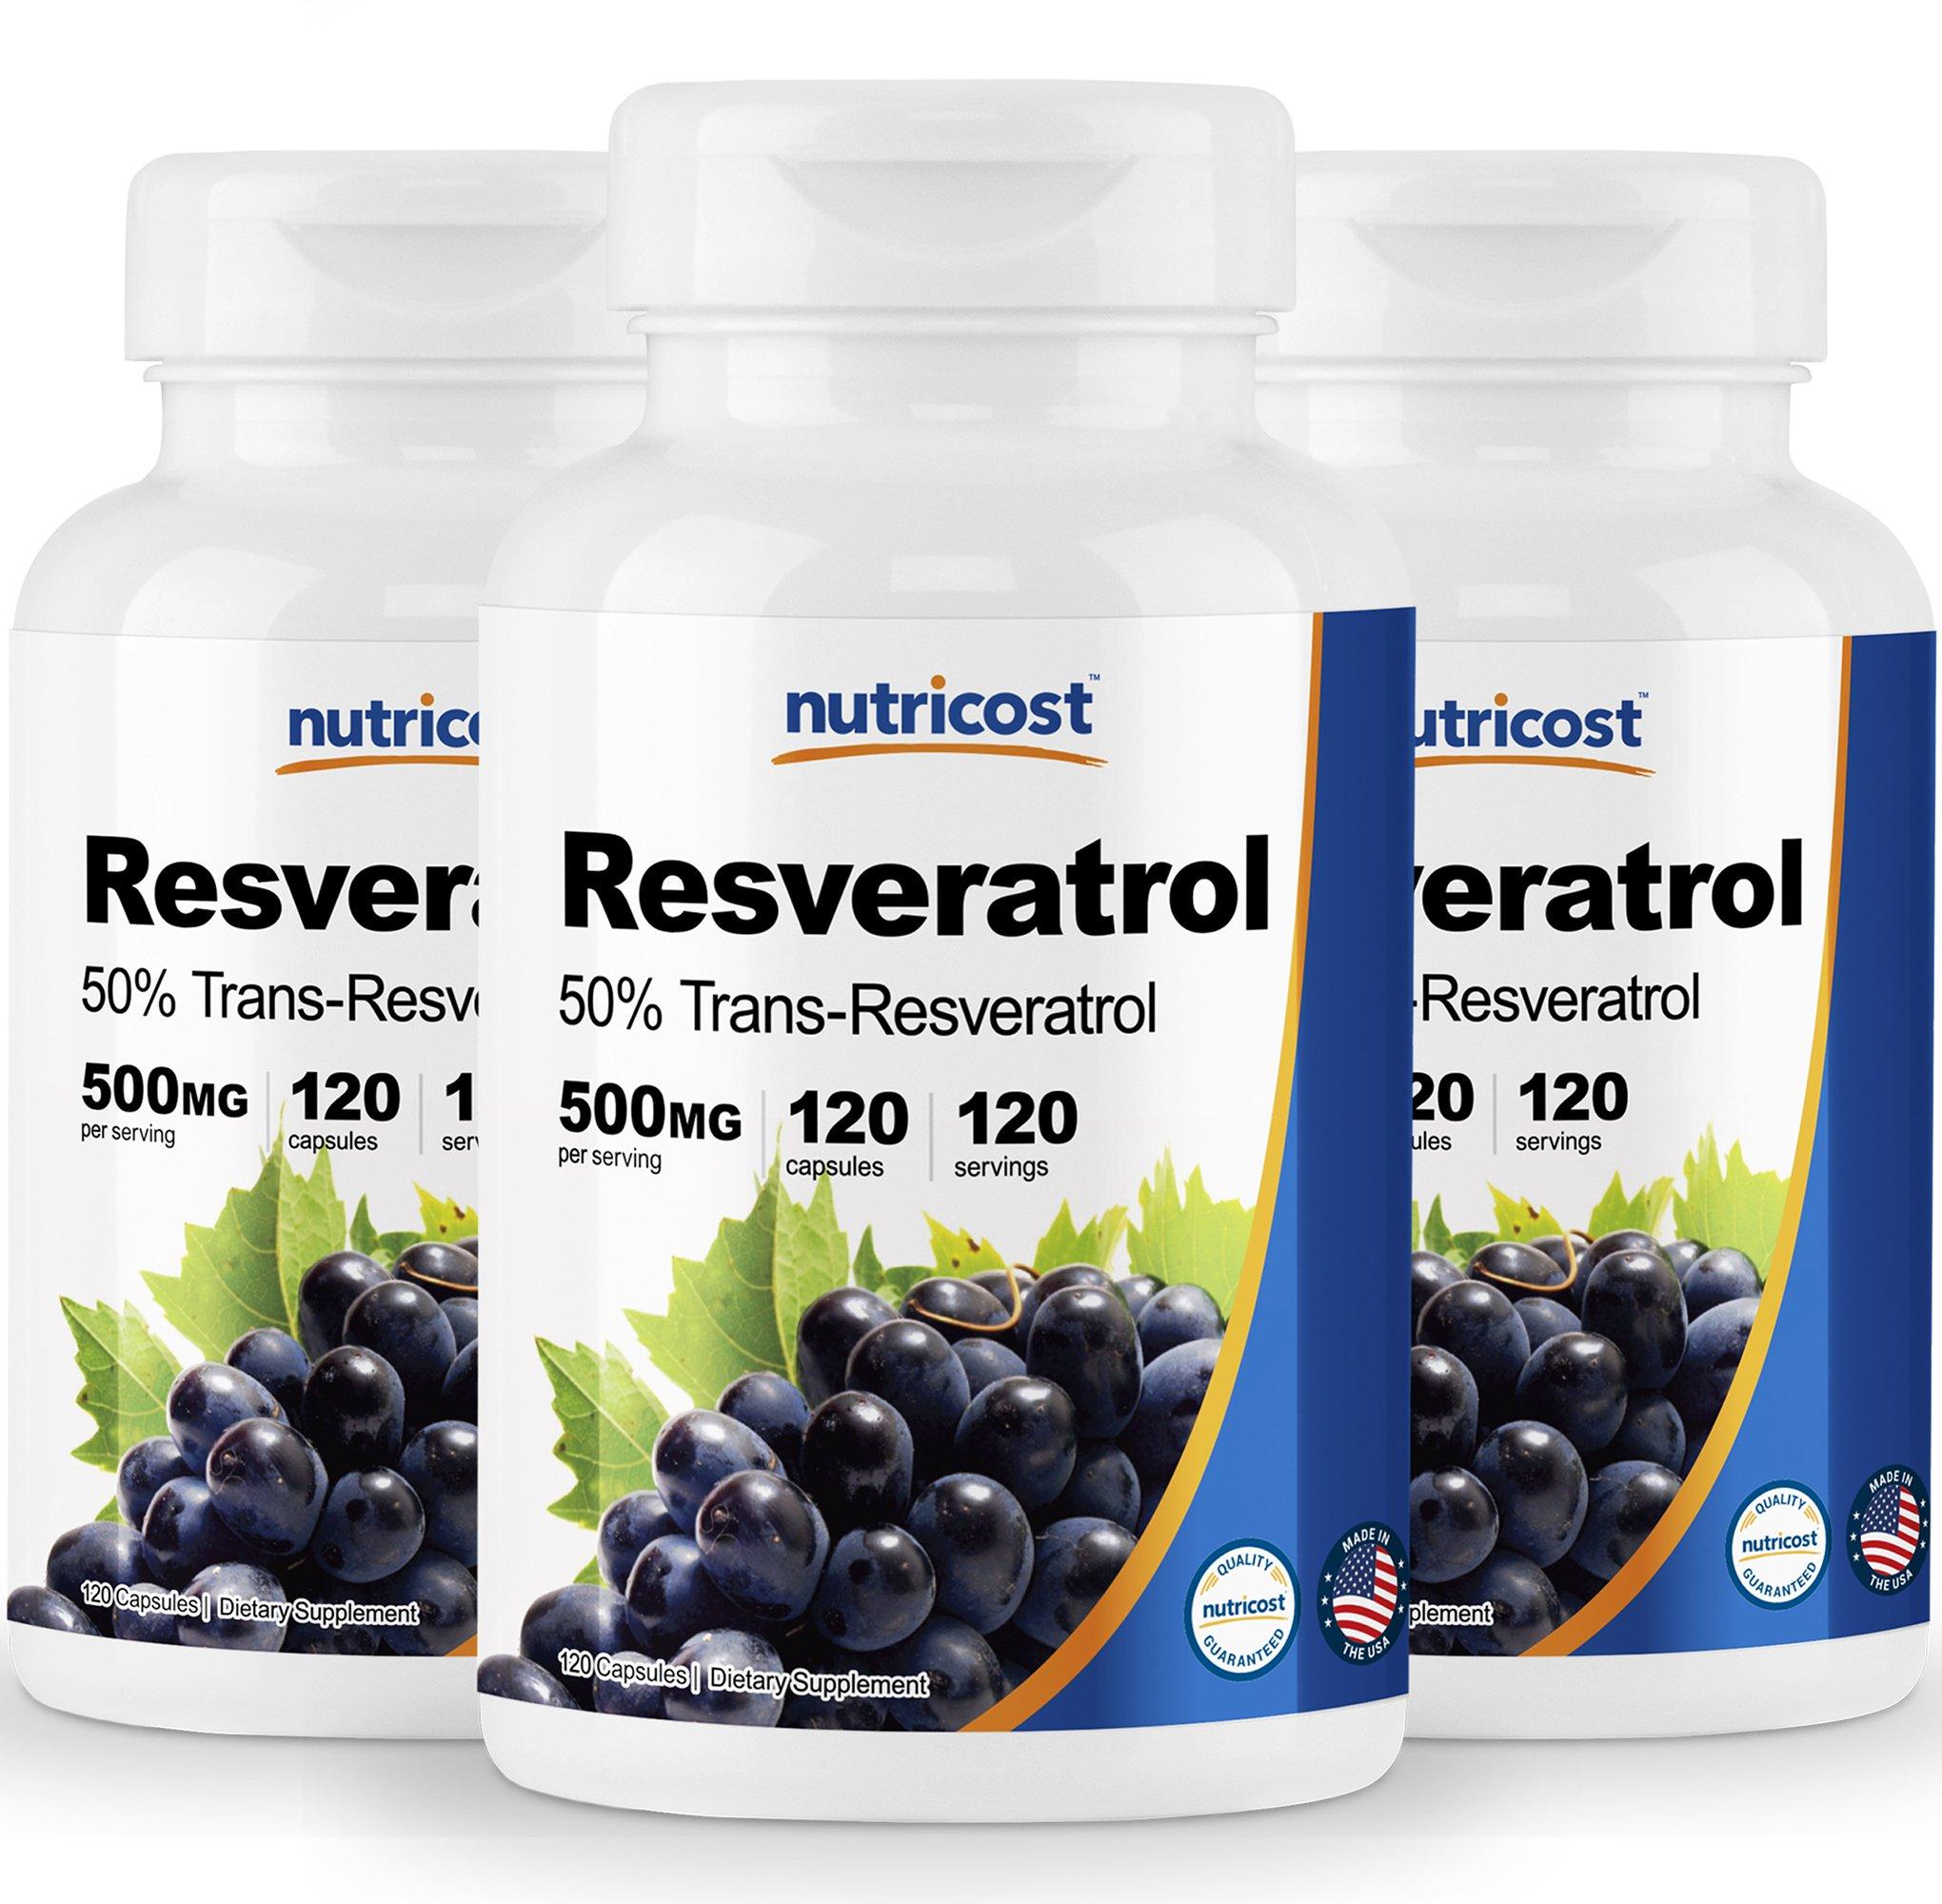 Nutricost Resveratrol 500mg; 120 Capsules - 50% Trans-Resveratrol (3 Bottles) by Nutricost